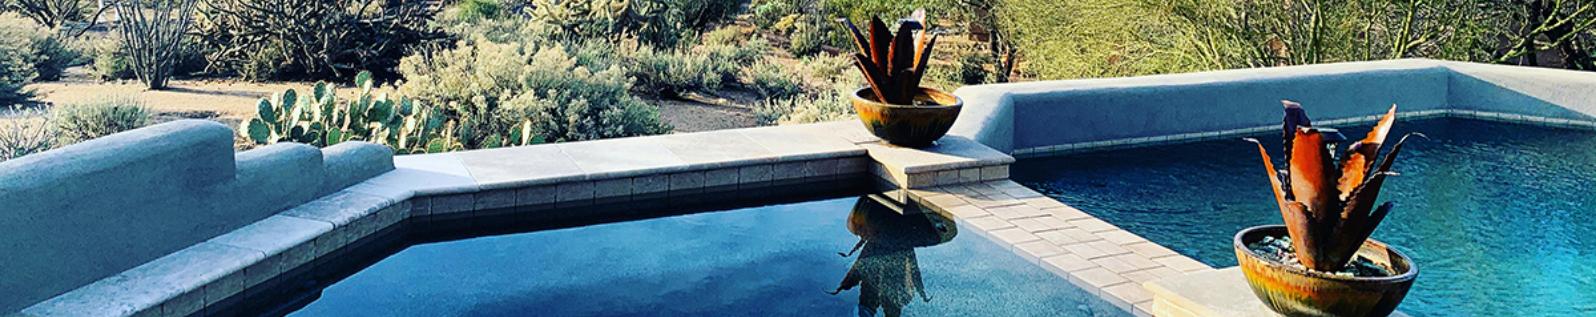 Arizona Home Check - Pool View